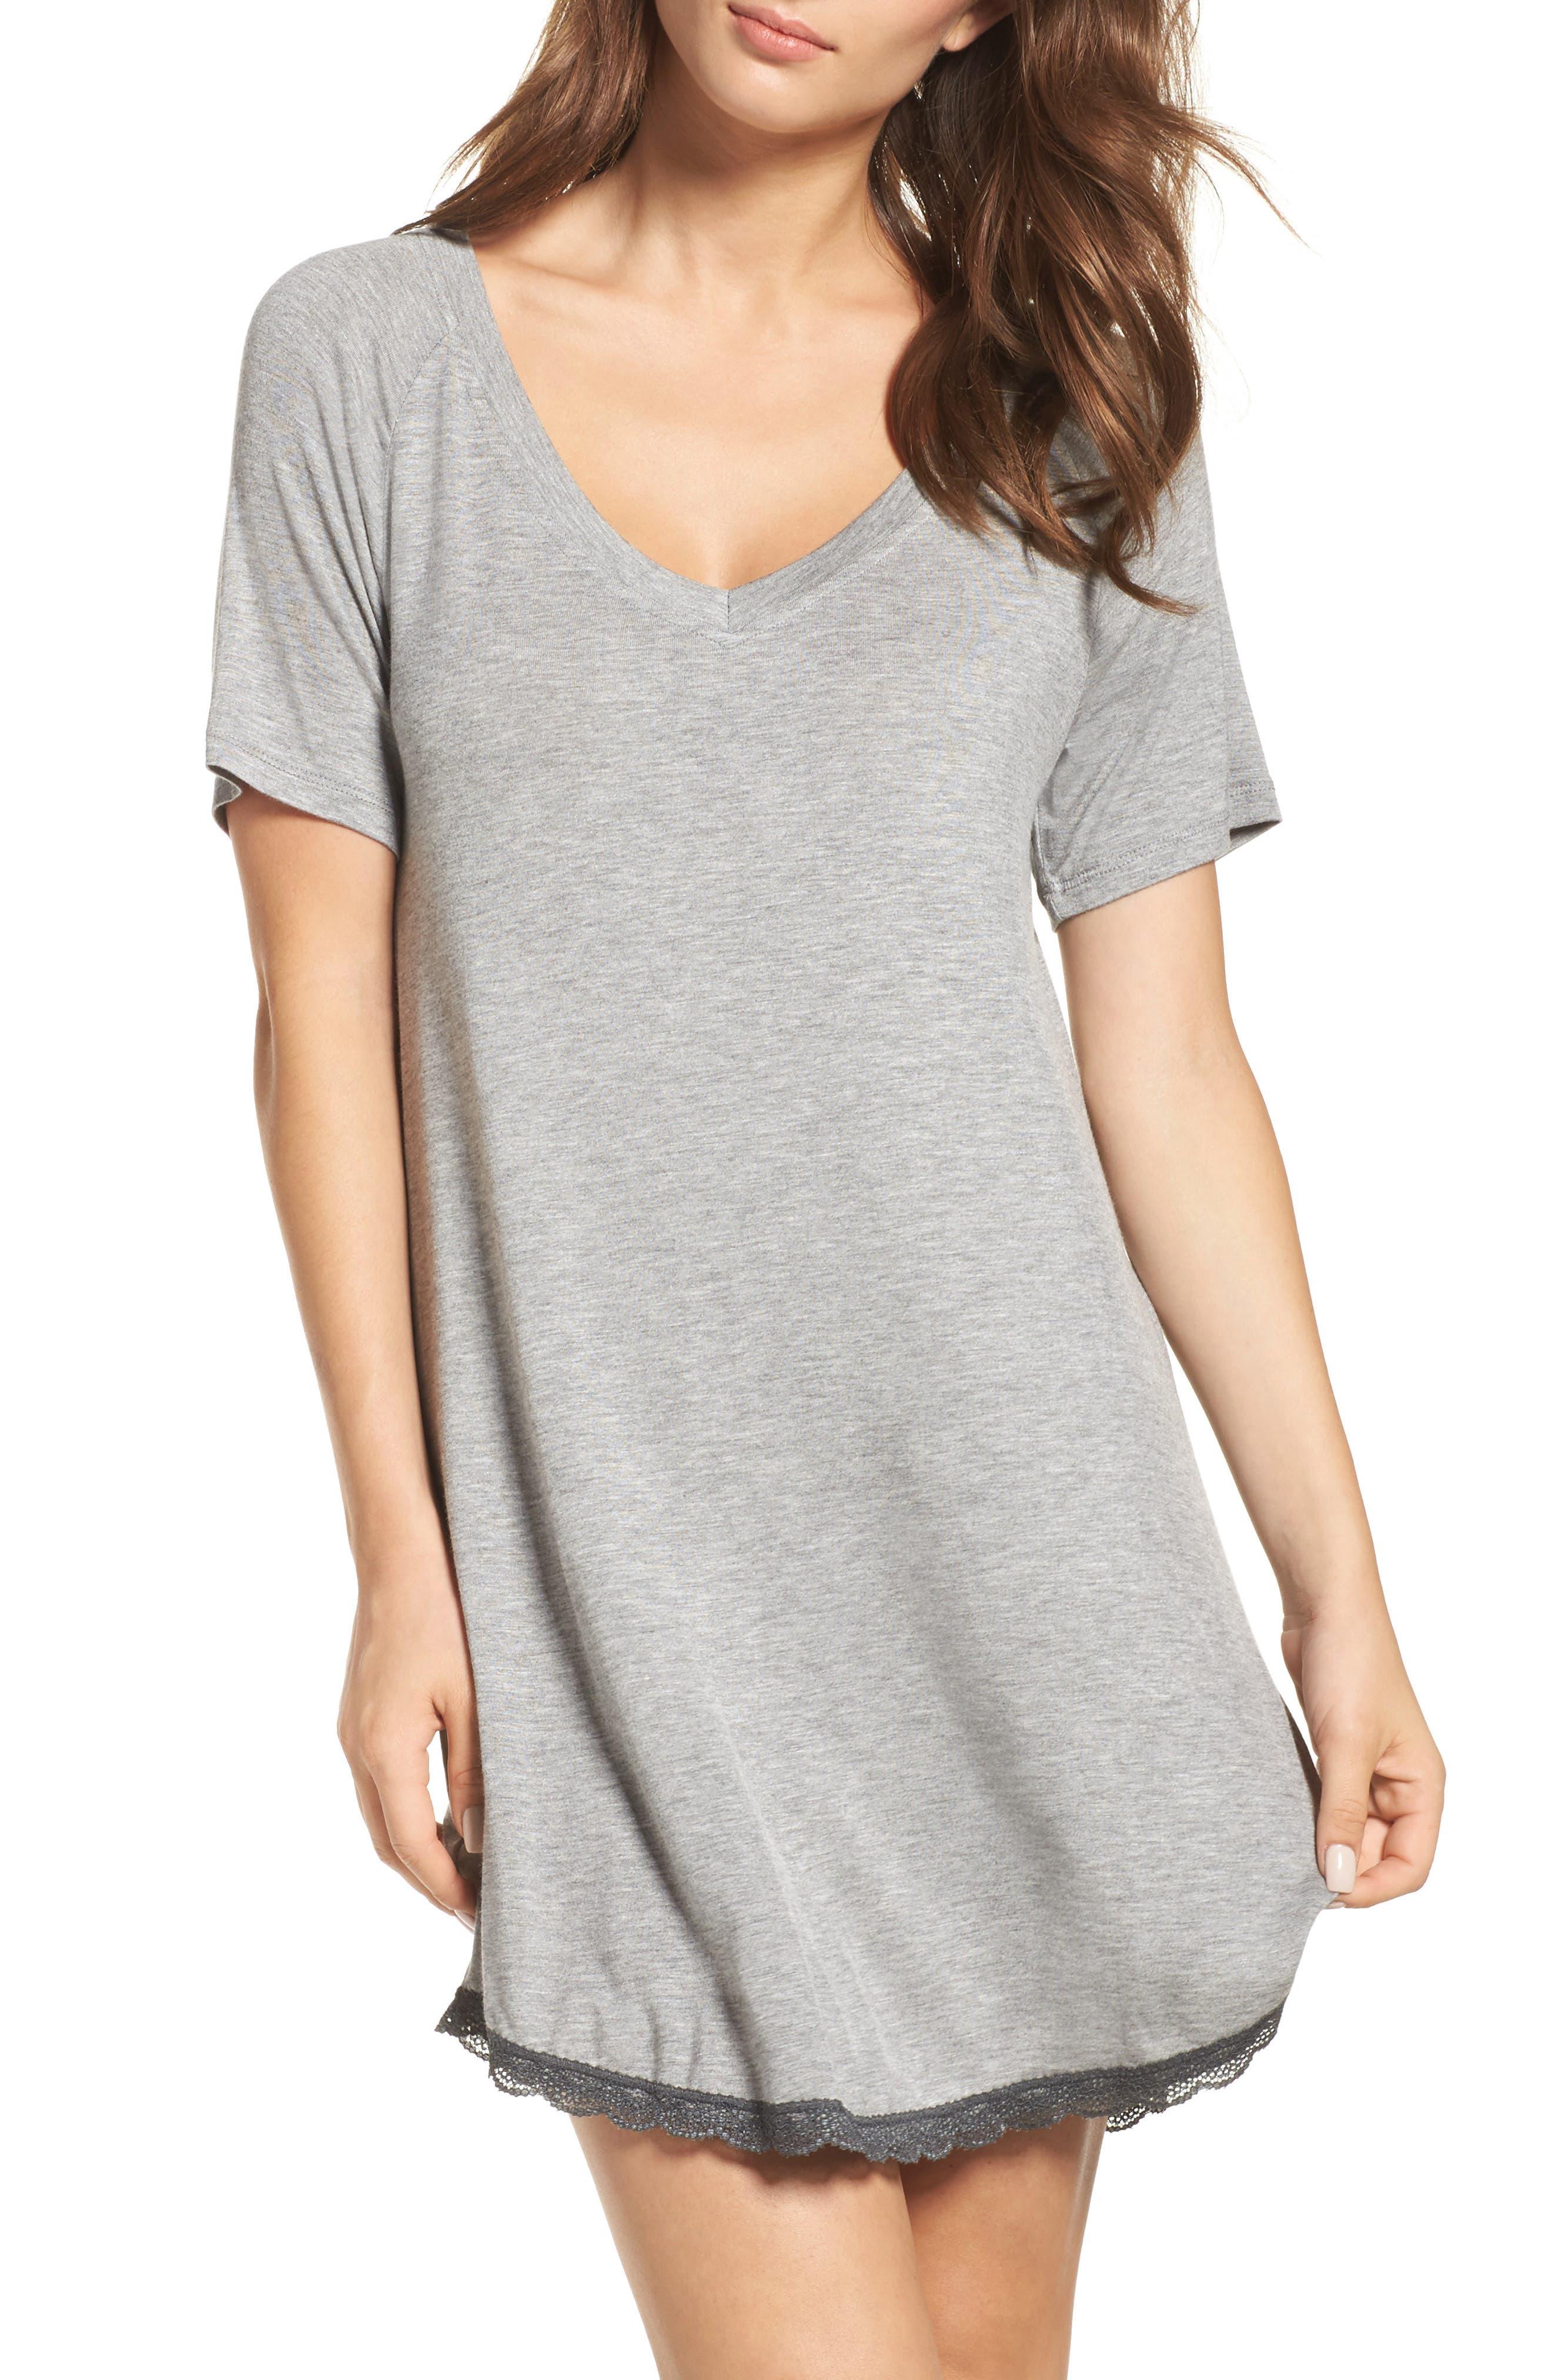 Honeydew Intimates All American Sleep Shirt, Grey